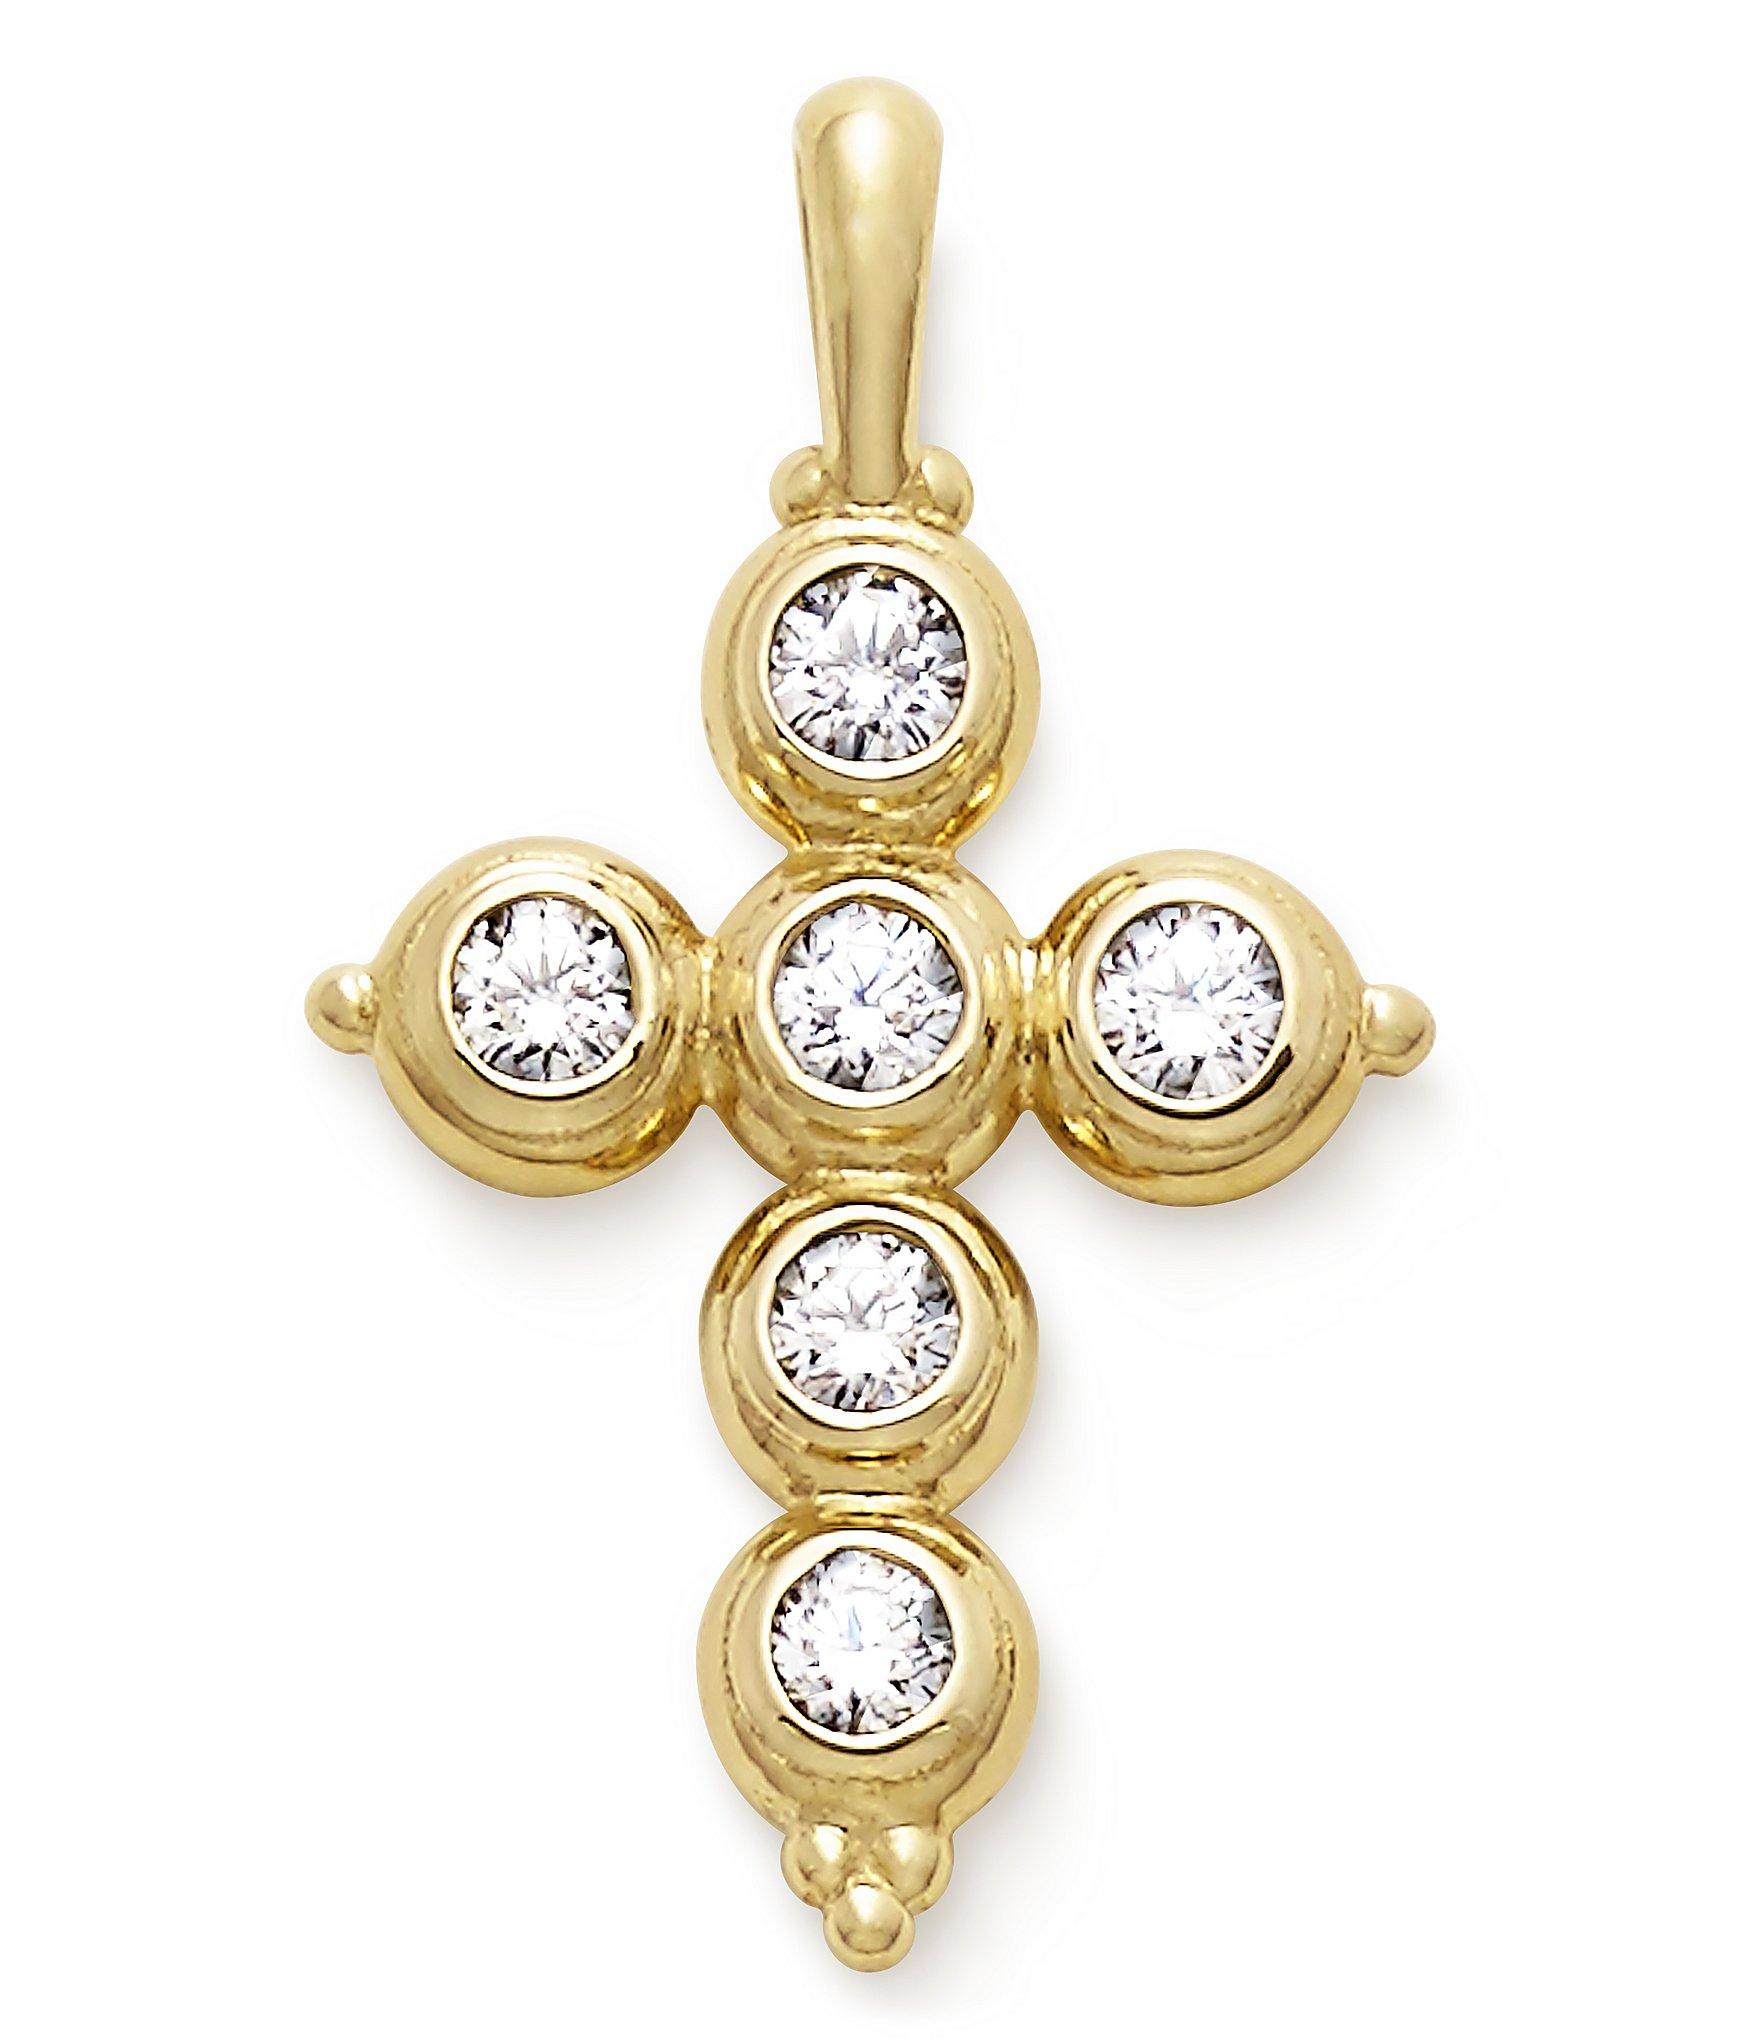 James Avery Mens Cross Necklace: James Avery 14K Gold Antiquity Cross Pendant With Diamonds